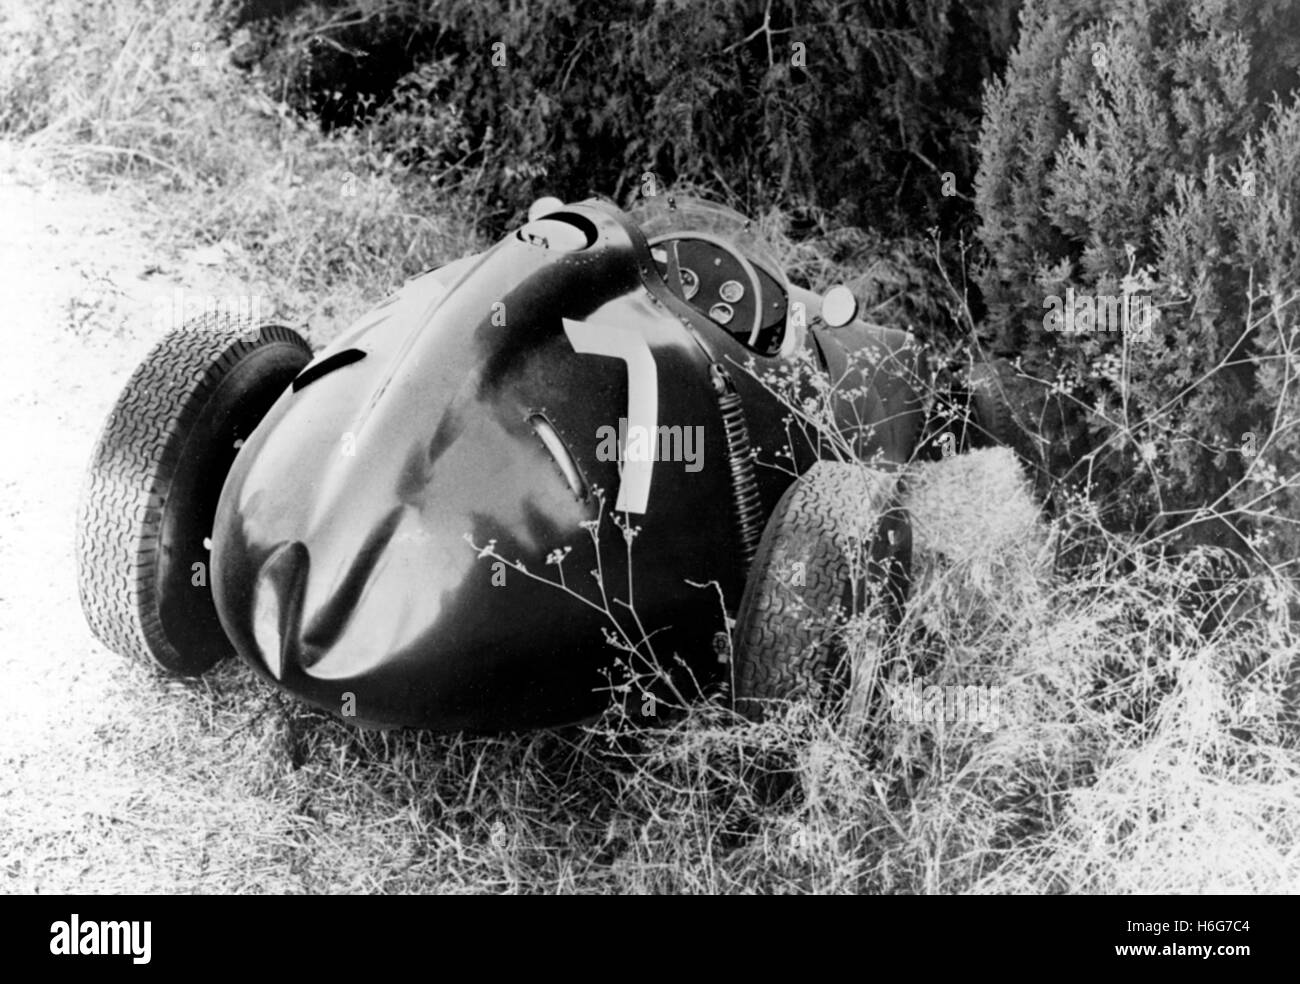 PORTUGUESE GP CRASHED BRM TYPE 25 1959 - Stock Image